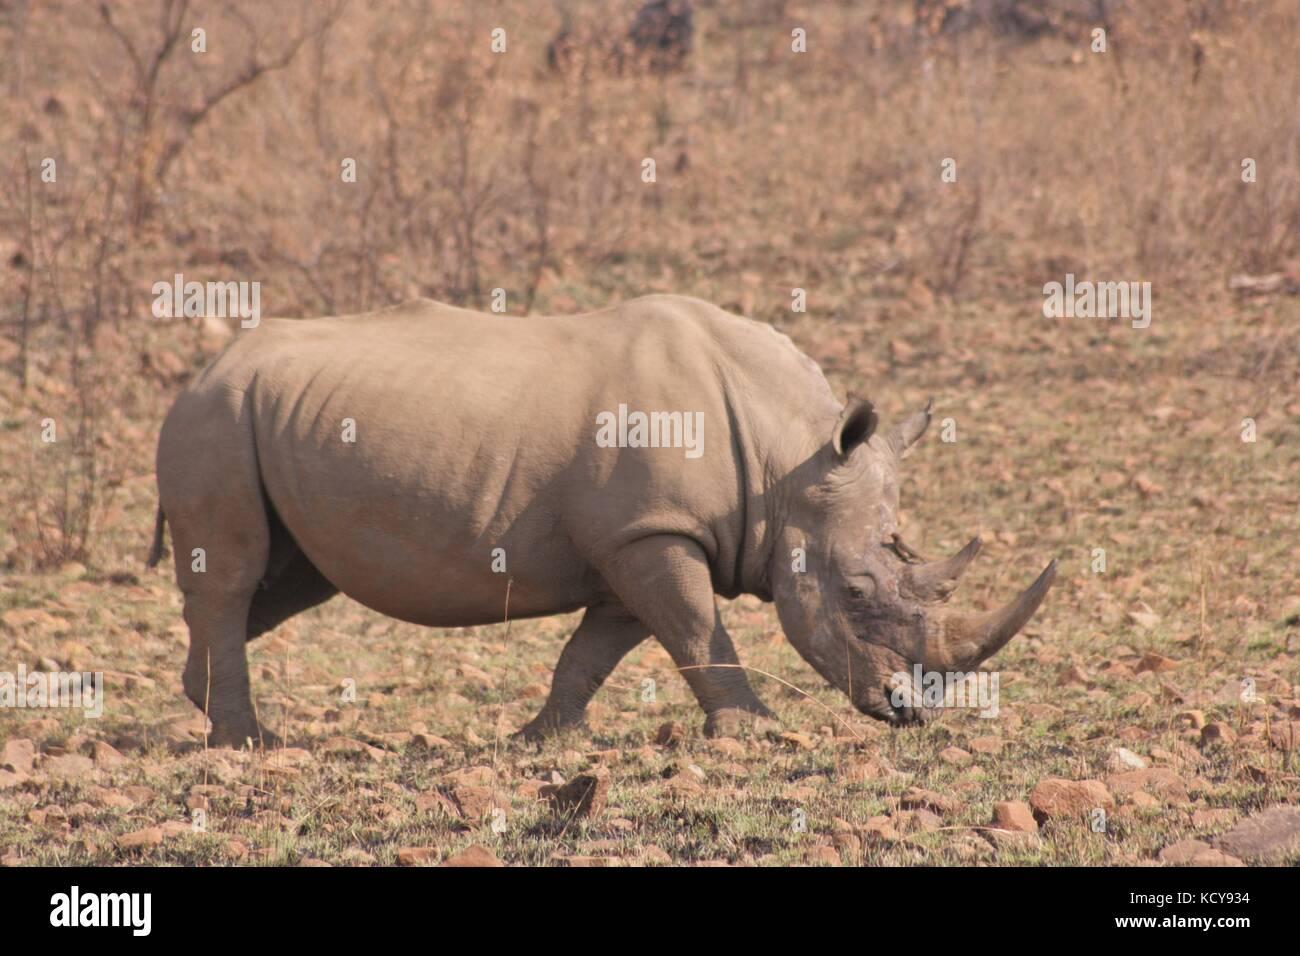 White Rhino walking in the Pilanesberg National Park, South Africa - Stock Image